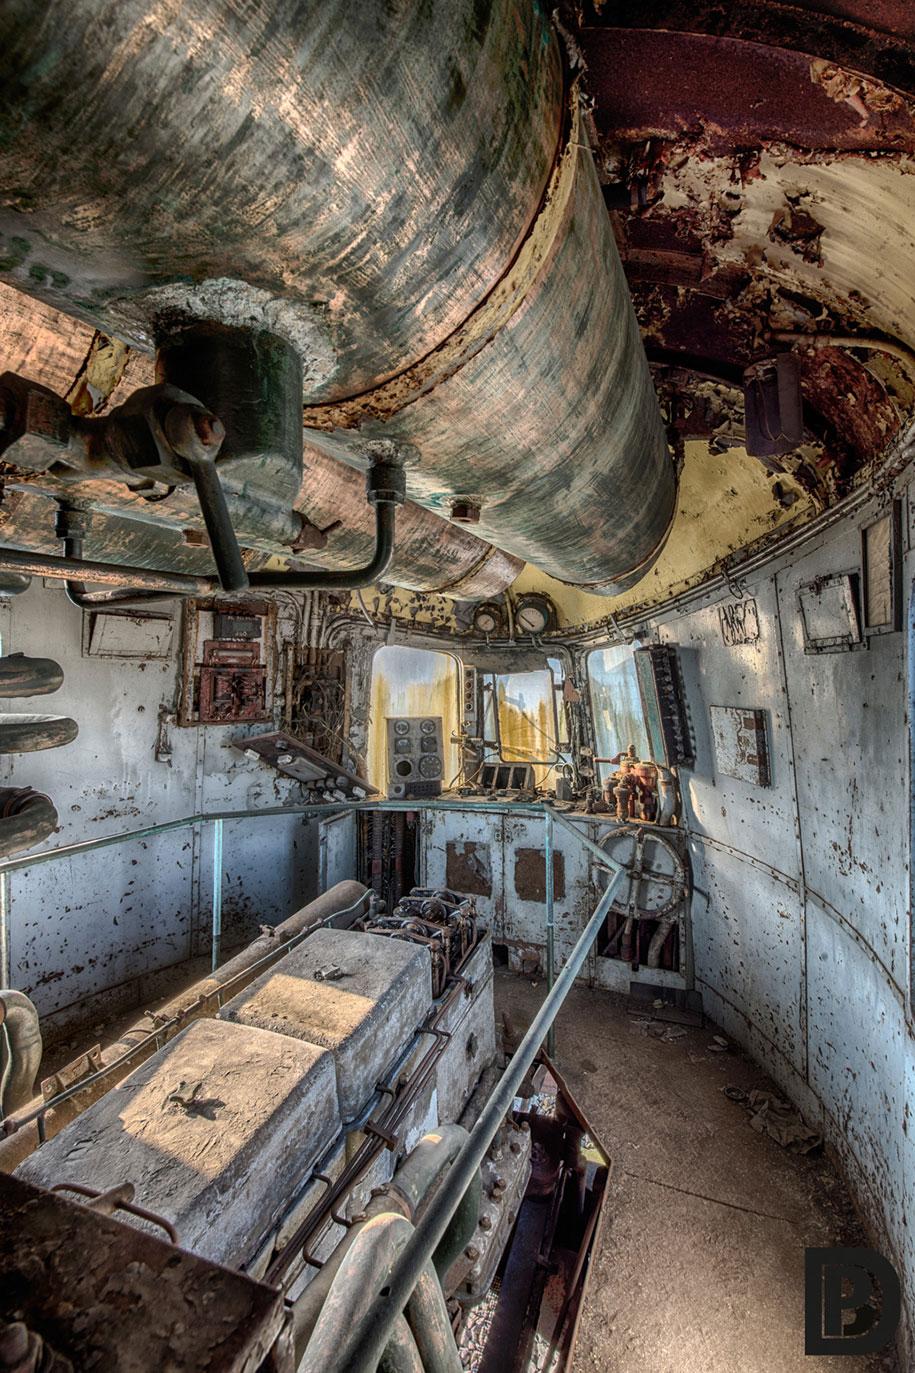 abandoned-train-orient-express-urban-exploration-brian-belgium-6